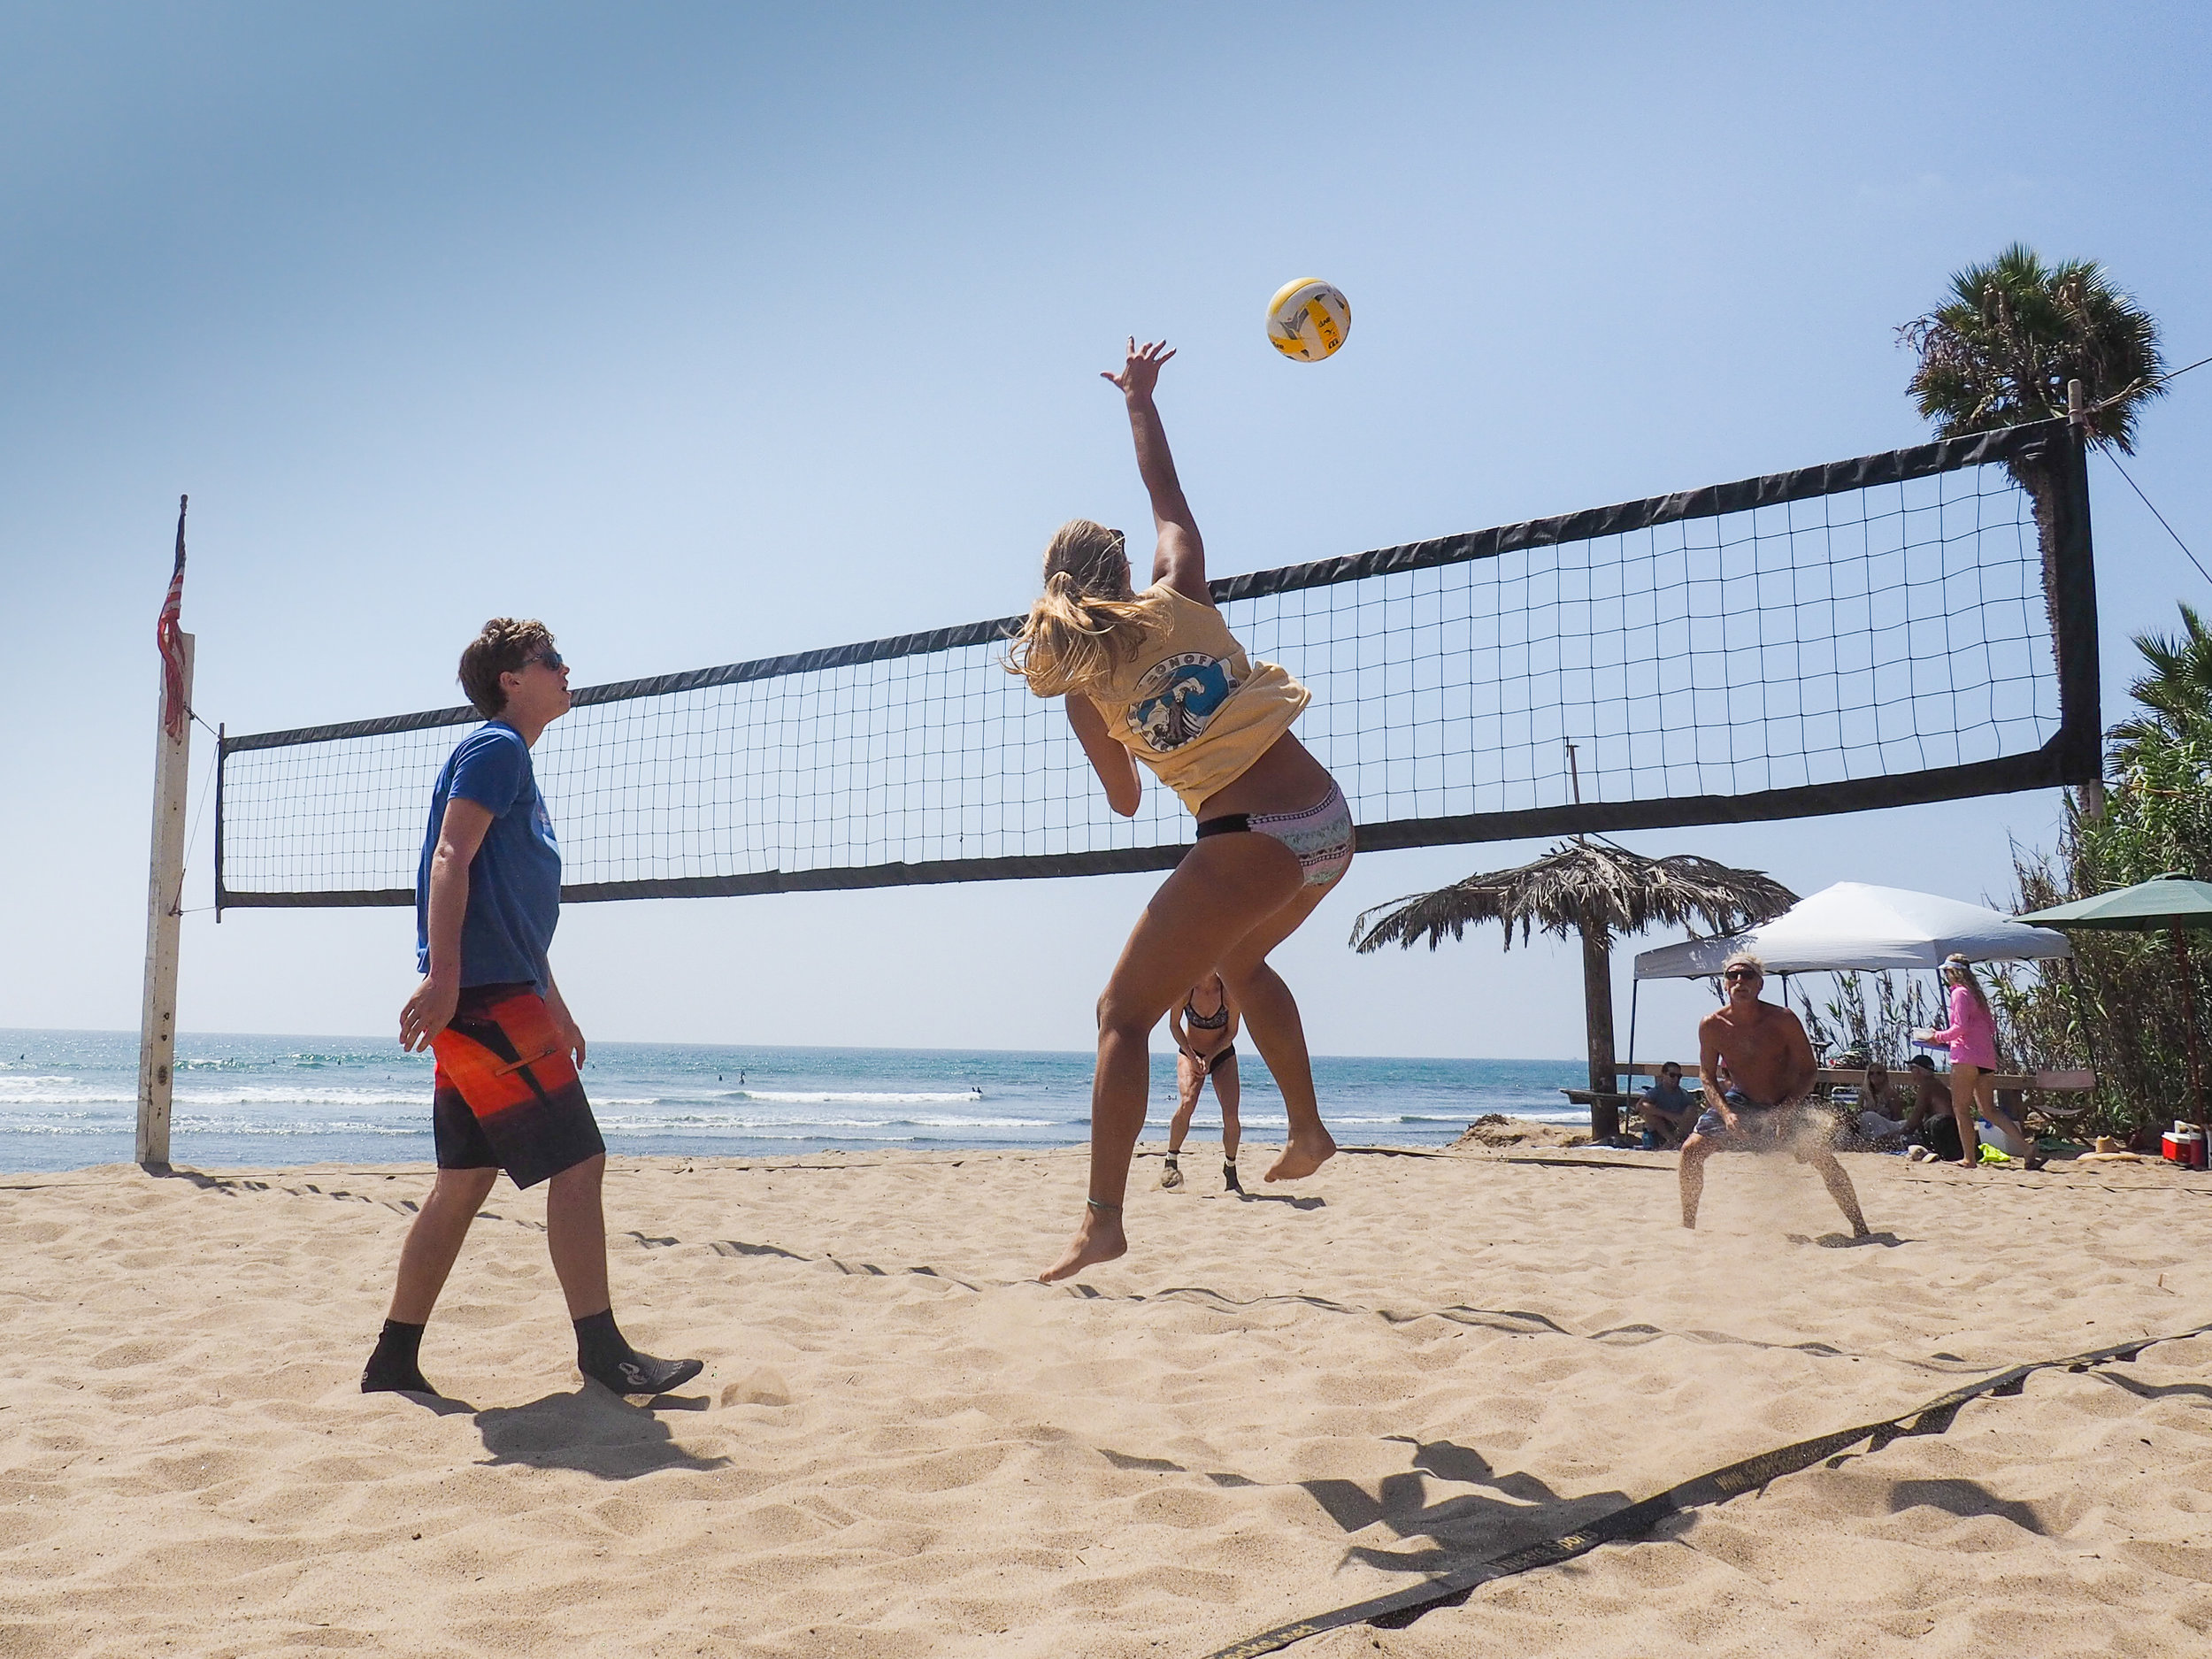 201808 vball beach SanO-104.jpg